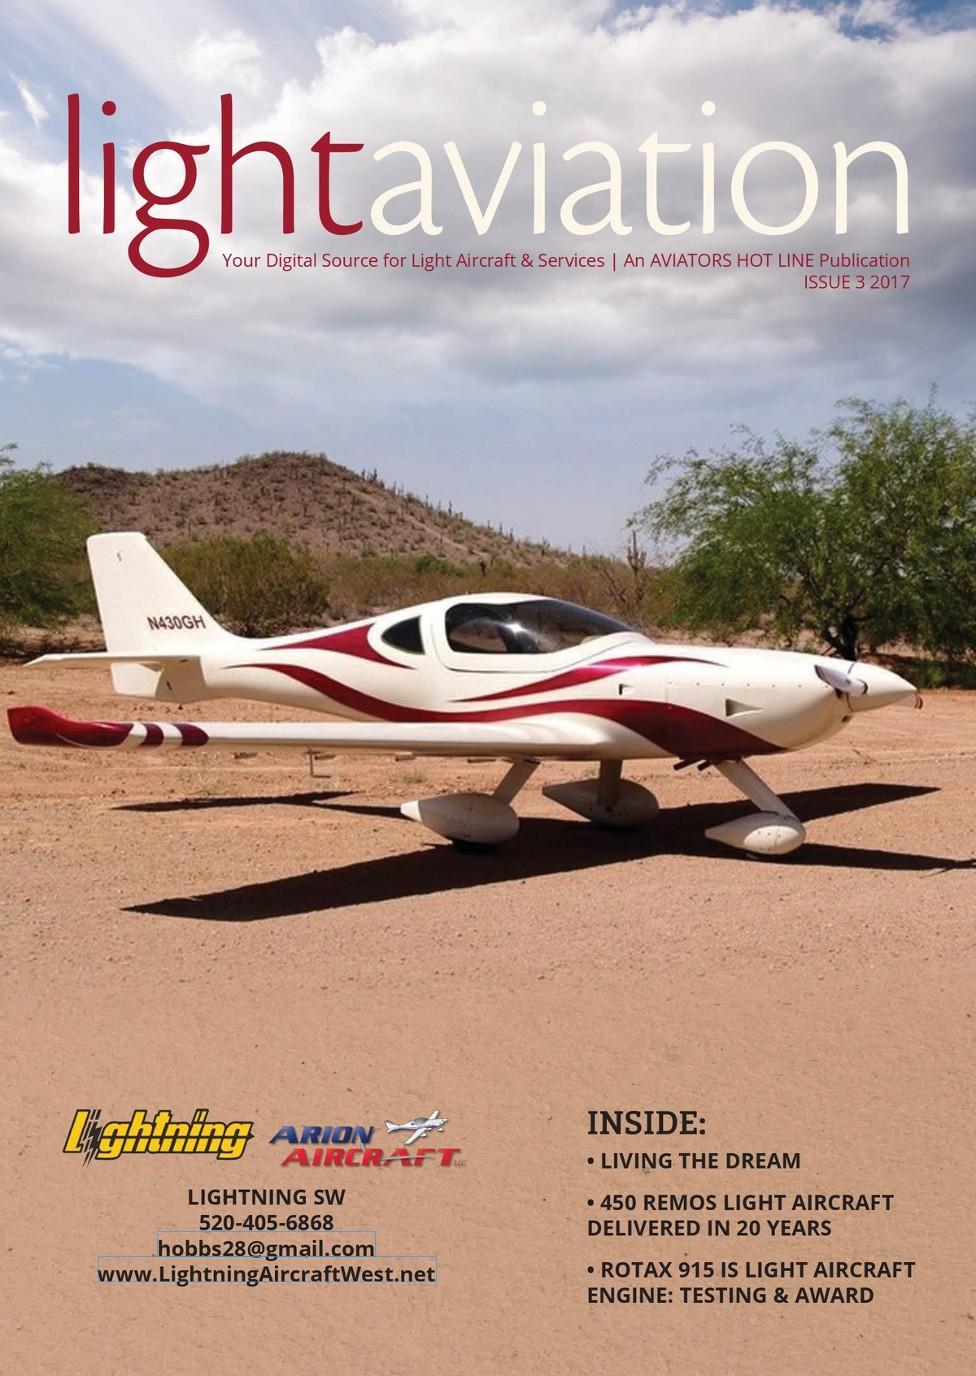 Light Aviation - Issue 3 2017